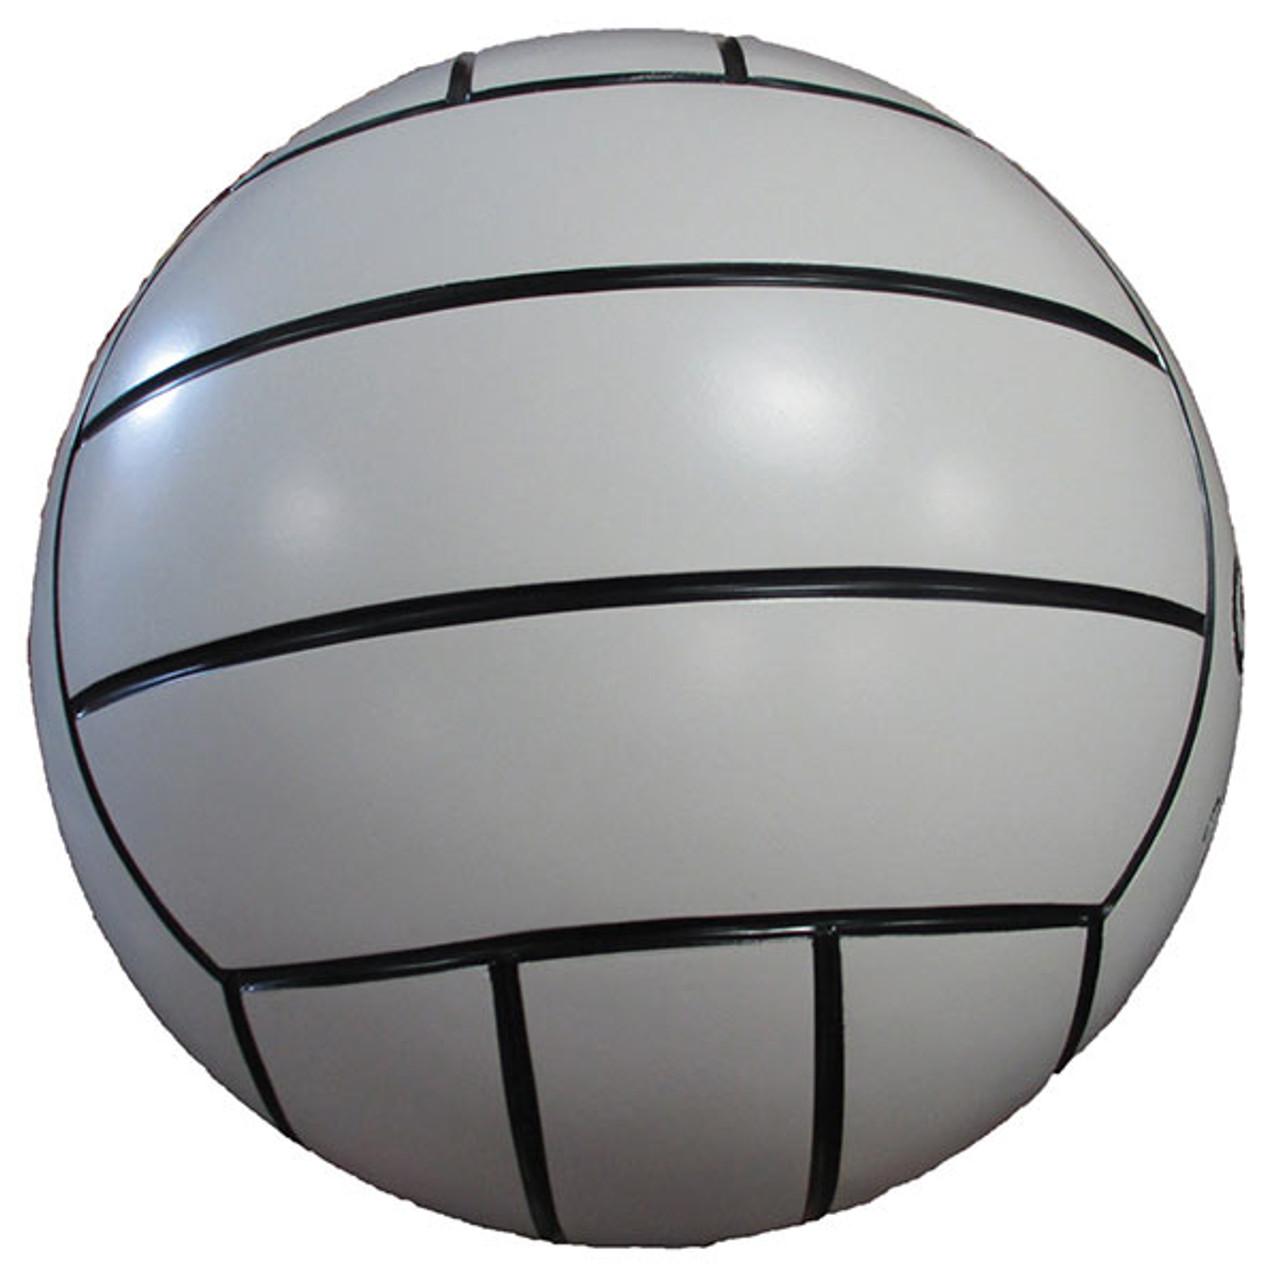 24 Inch Volleyball Bollard Safety Barrier Sphere TF6303